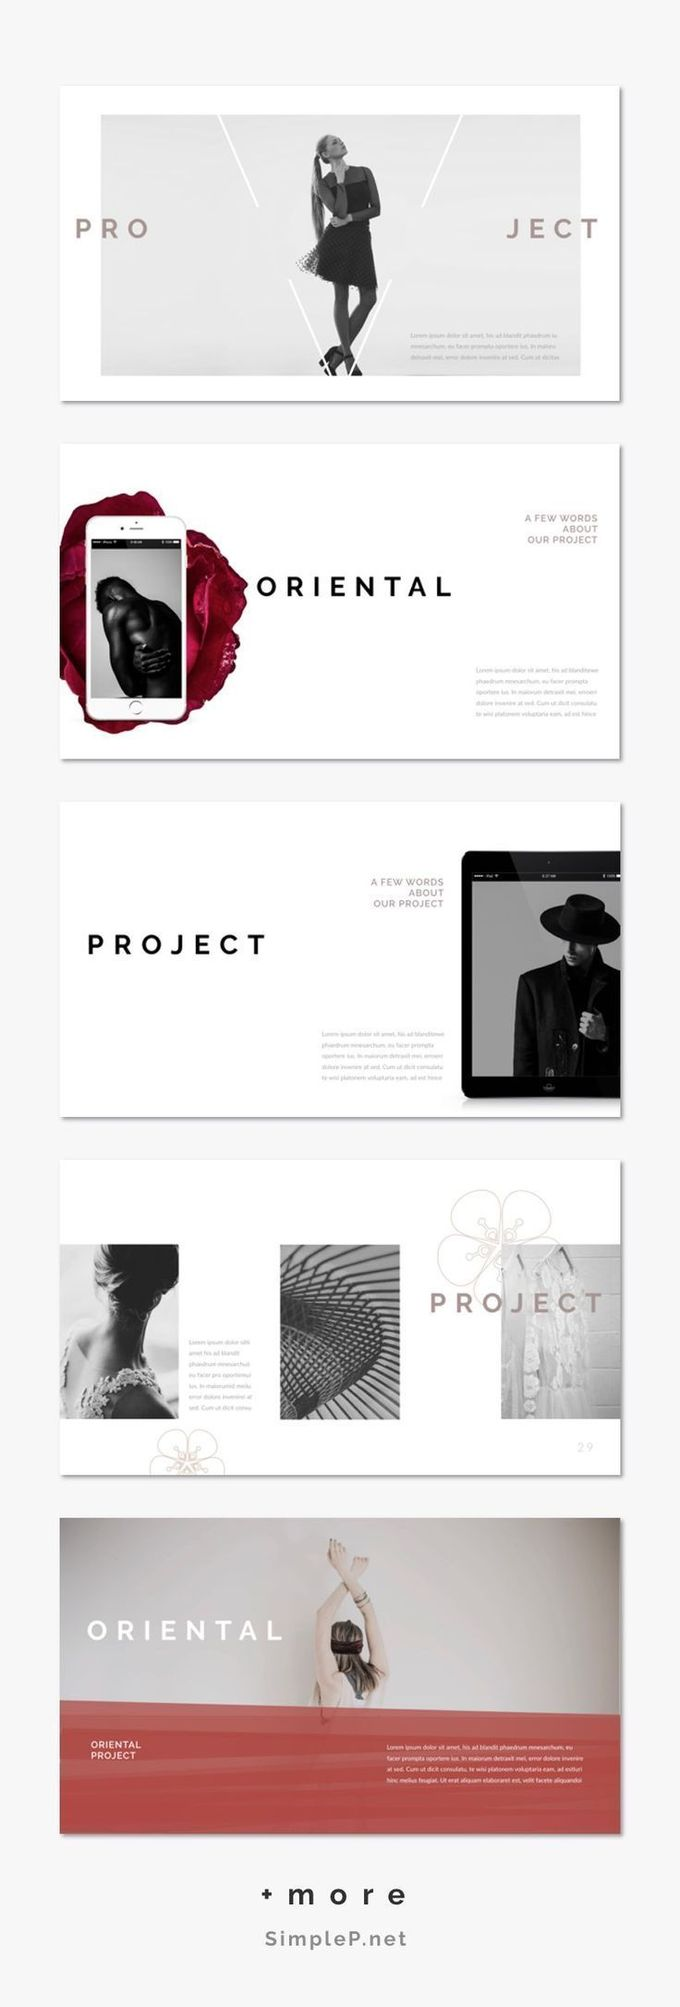 Modern Portfolio Presentation Template #ppt #powerpoint #oriental #rose #mockup #business #marketing